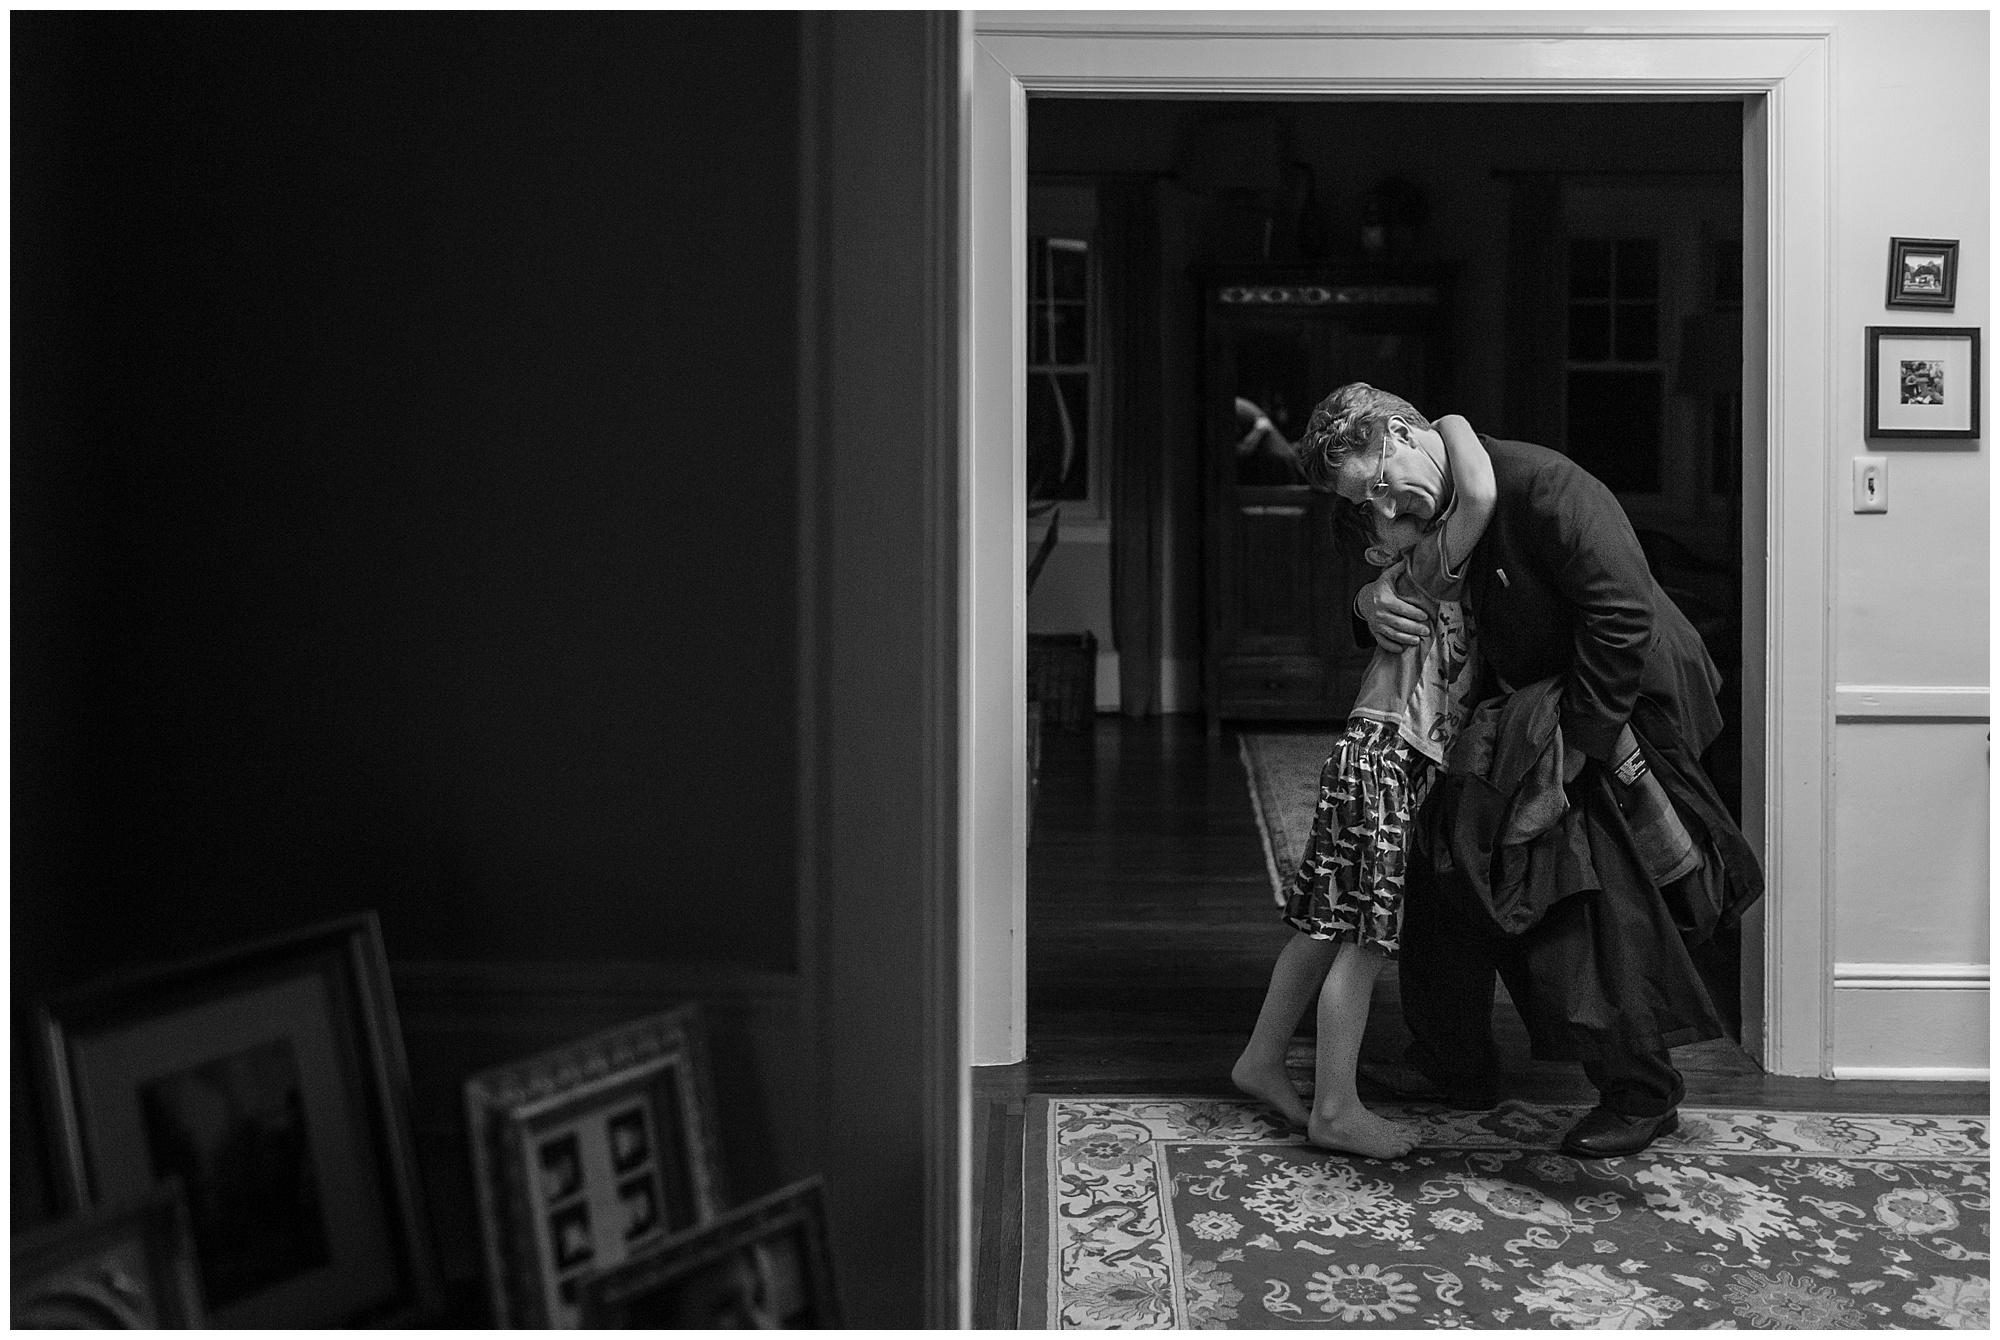 Little boy greets dad in hallway after work.